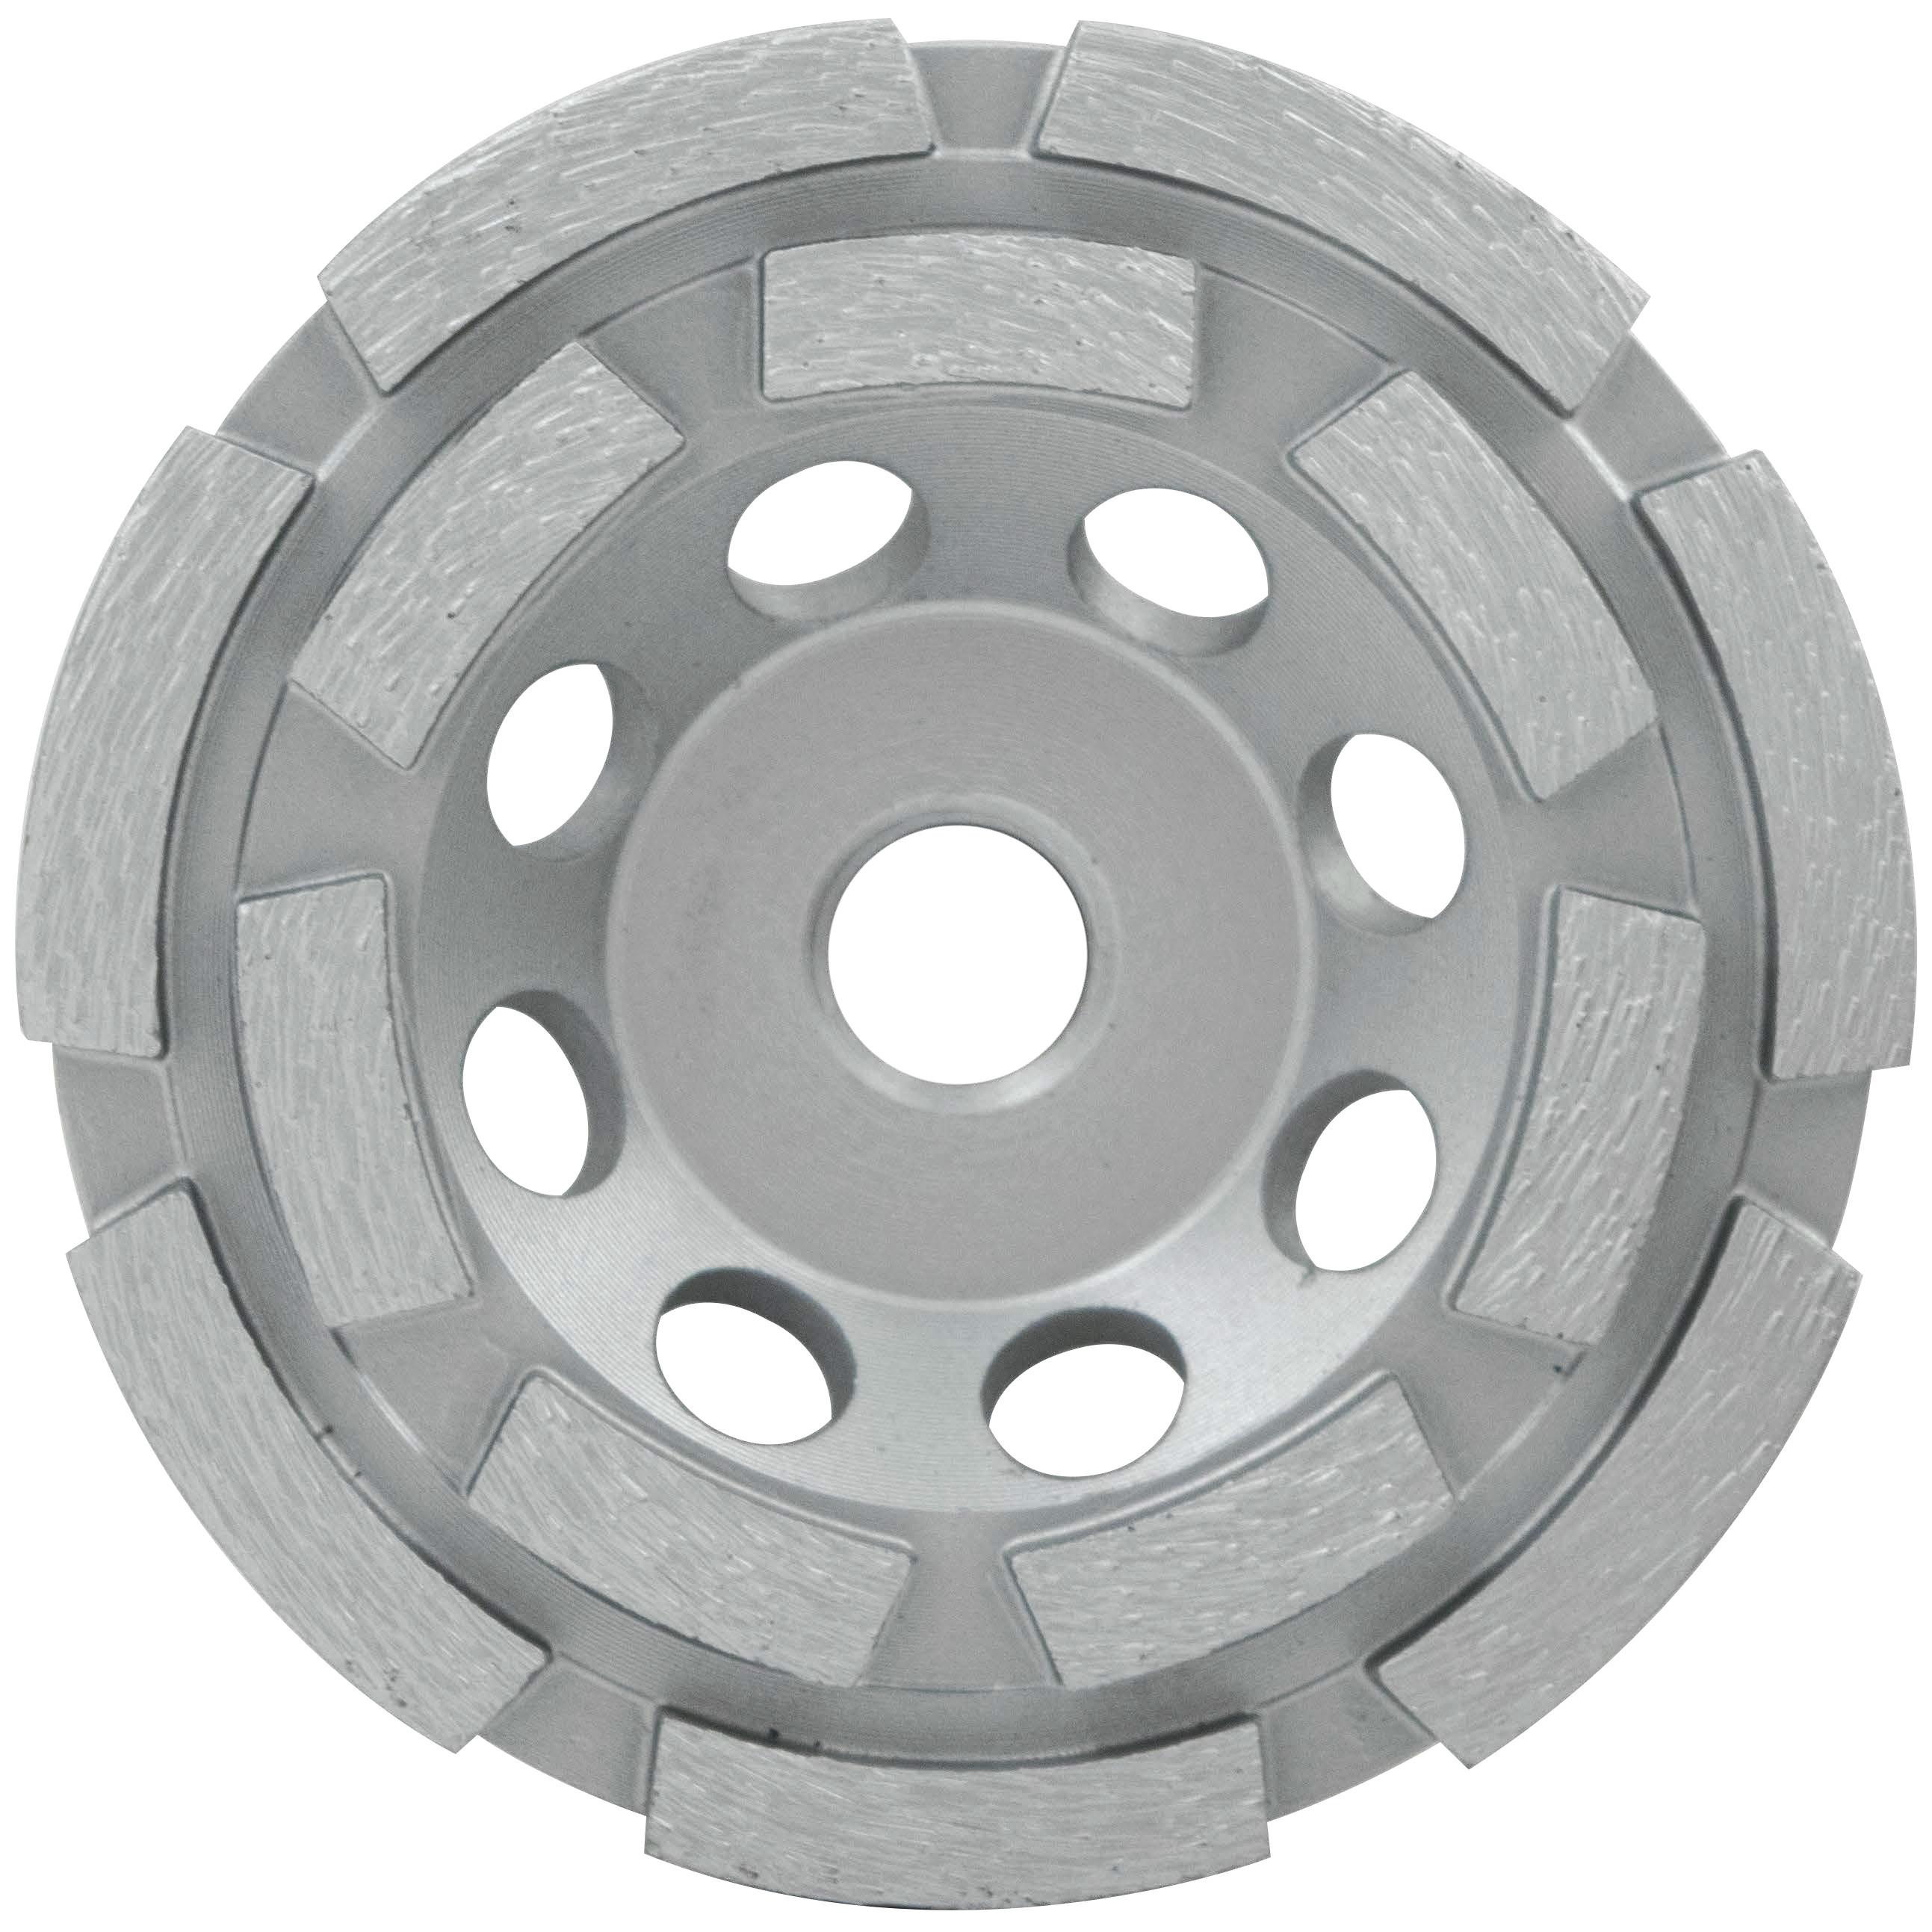 Milwaukee® 49-93-7770 Double Row Cup Wheel, 7 in Dia, Diamond Abrasive